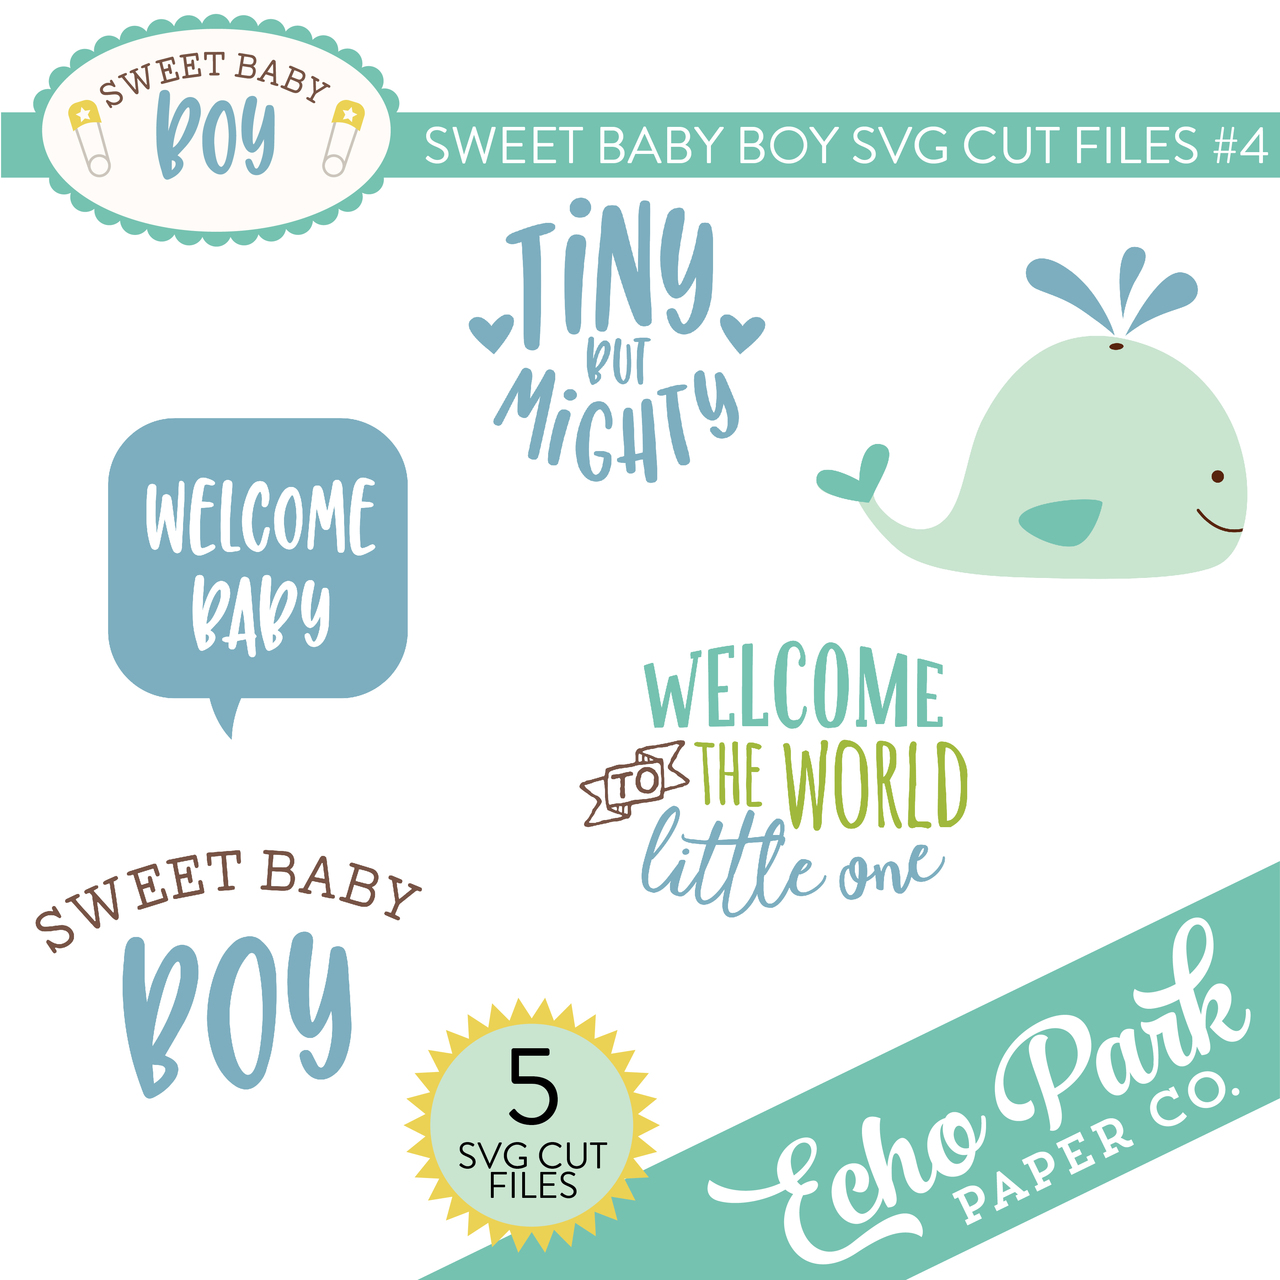 Sweet Baby Boy SVG Cut Files #4